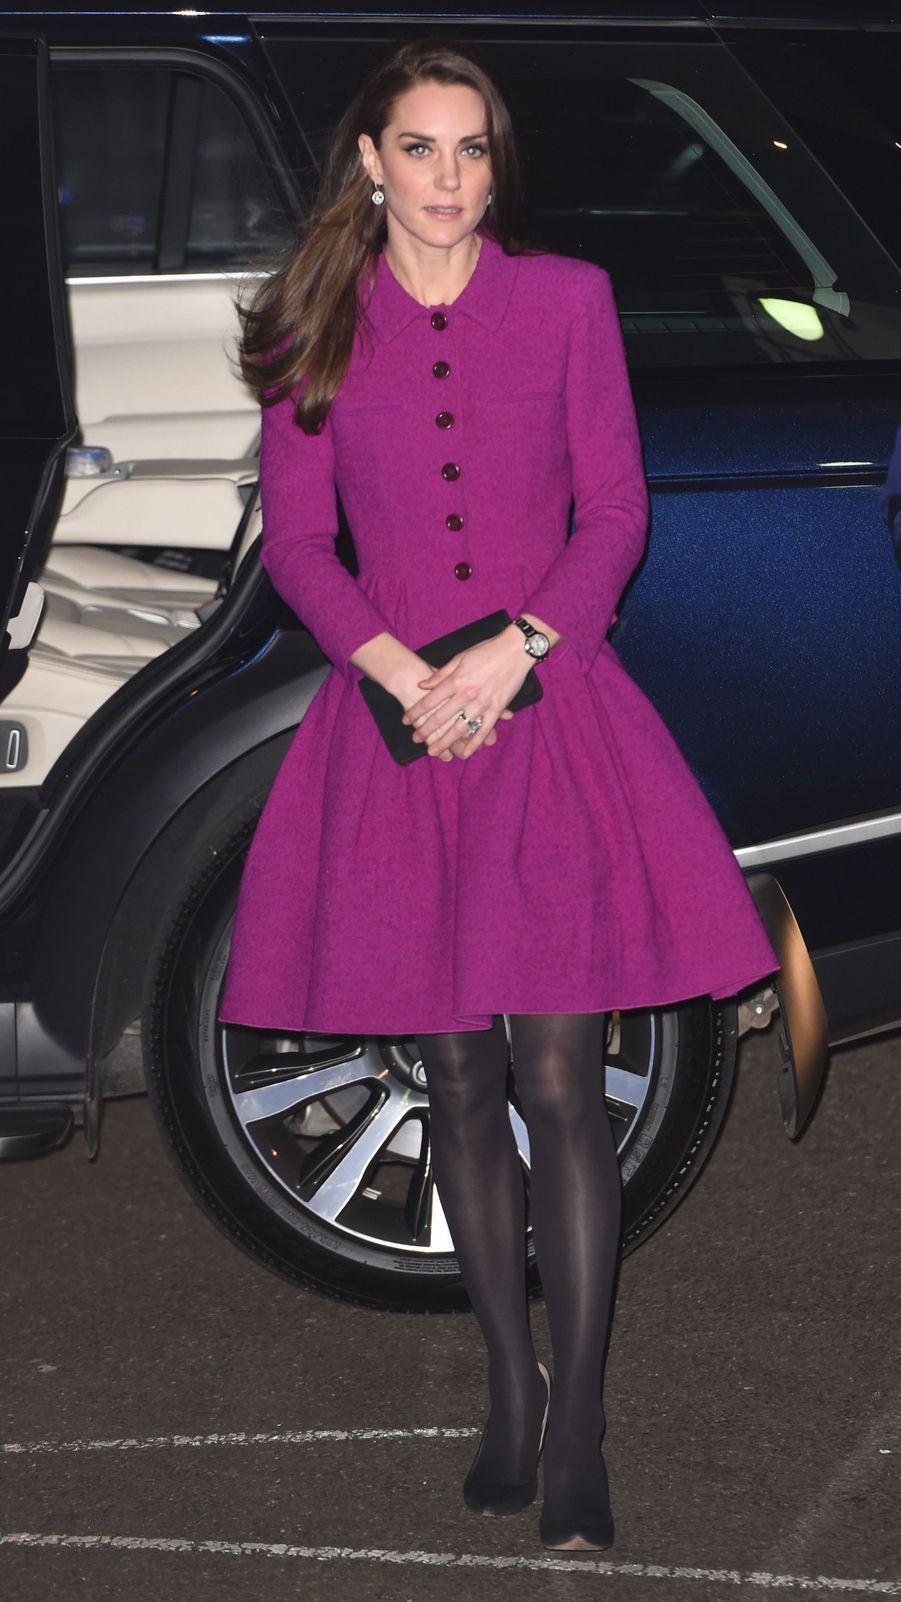 La duchesse Catherine de Cambridge en Oscar de la Renta, le 6 février 2017